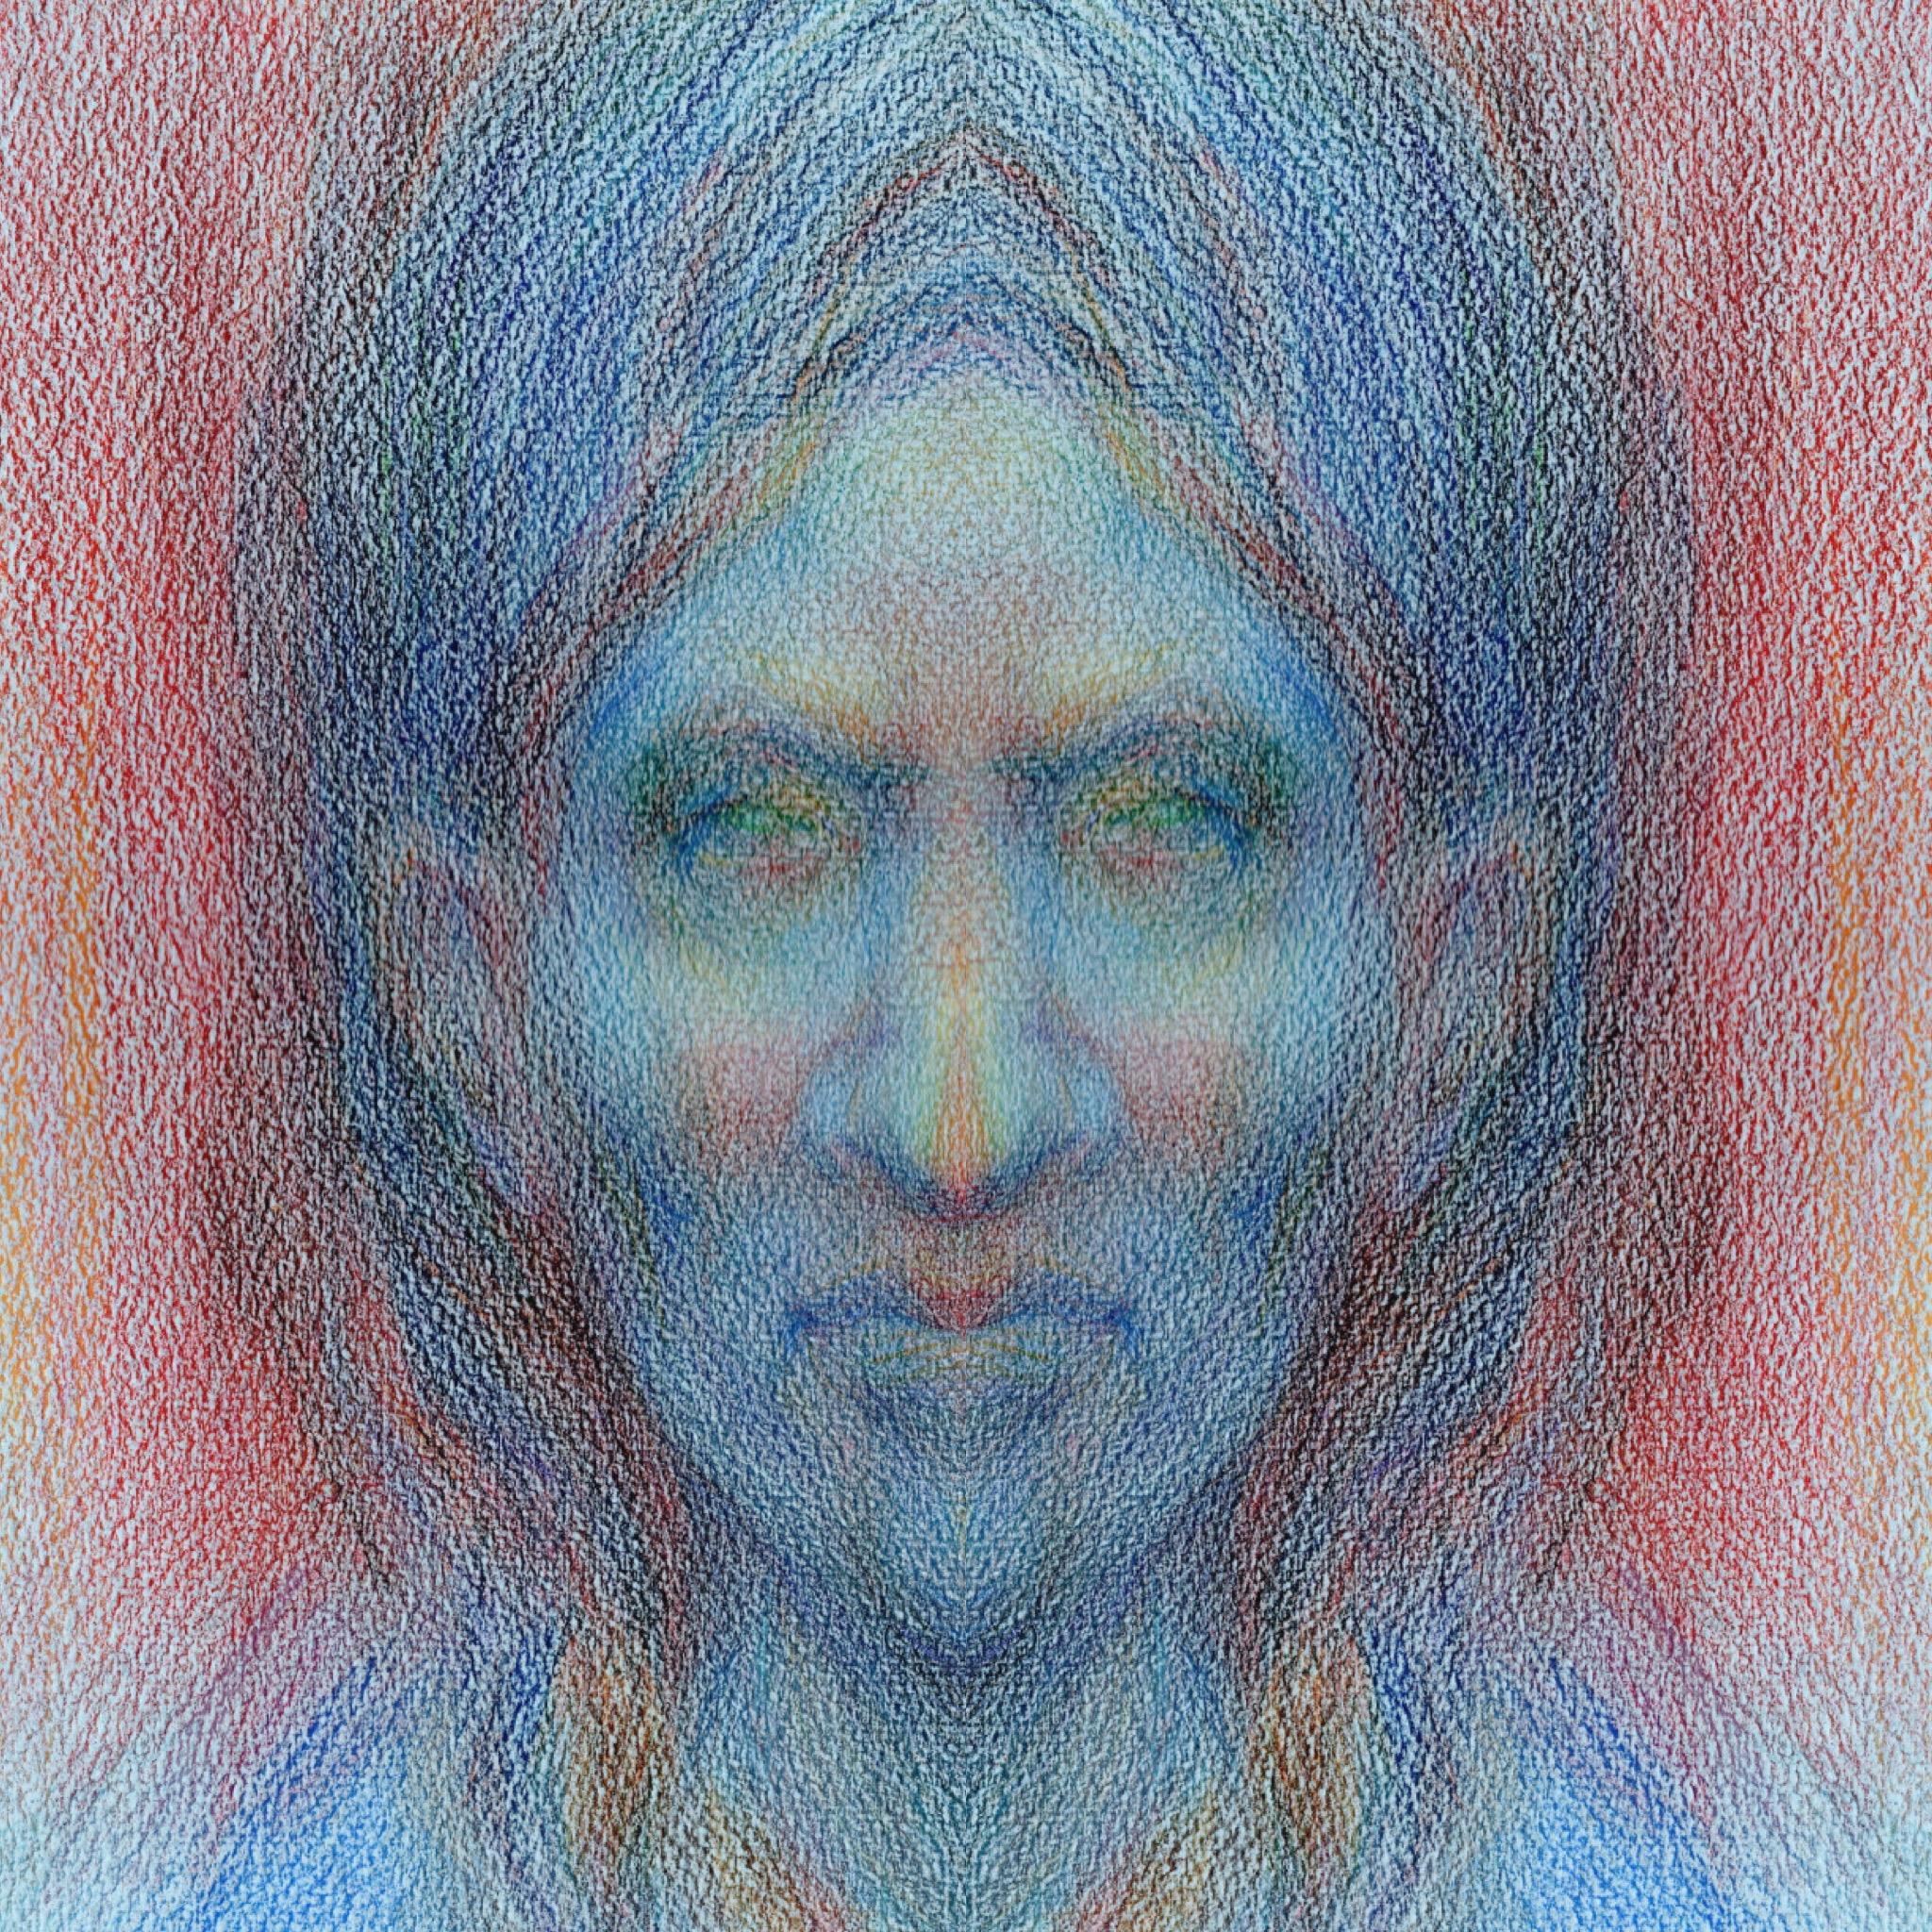 Sonja Bunes Symmetrisk er sjeldent Digital Collage 2020 02